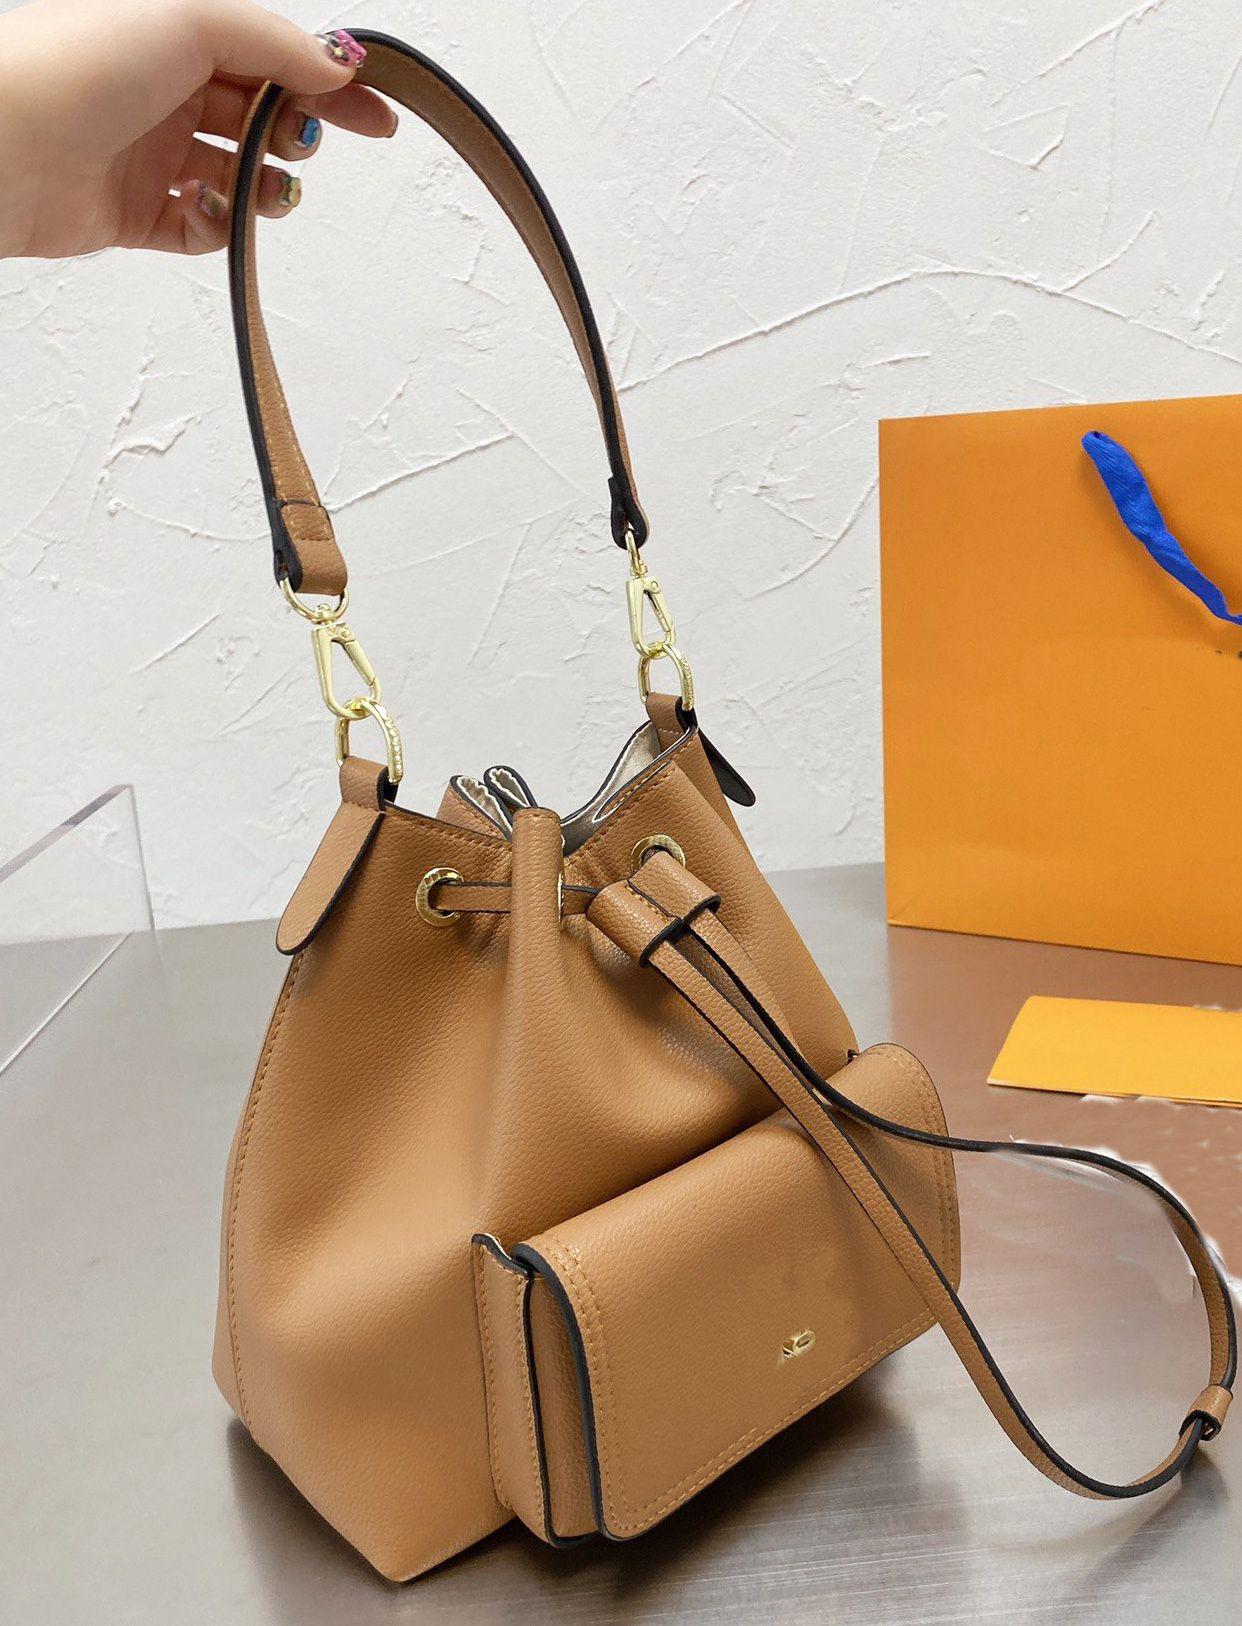 Designer Crossbody Tote Borsa a tracolla Messenger Handbag Portafoglio Sella borsa Lvlouis Vutton Zaino con logo Gucci A27